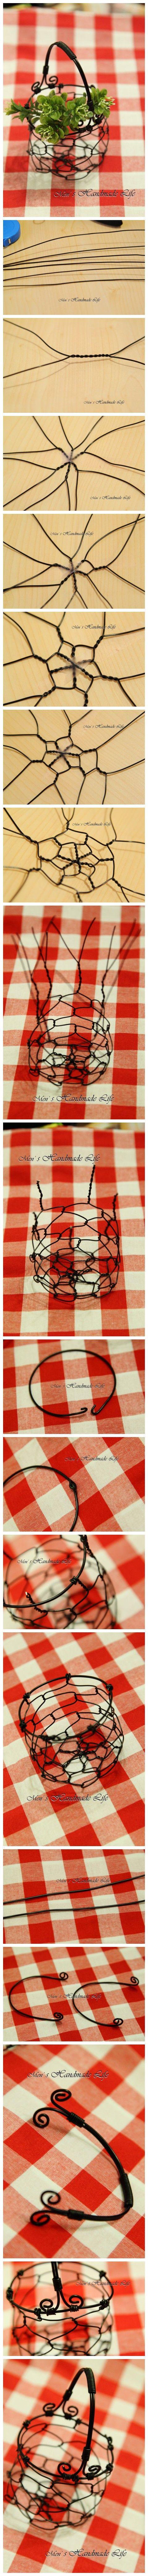 Fine wire woven basket tutorial